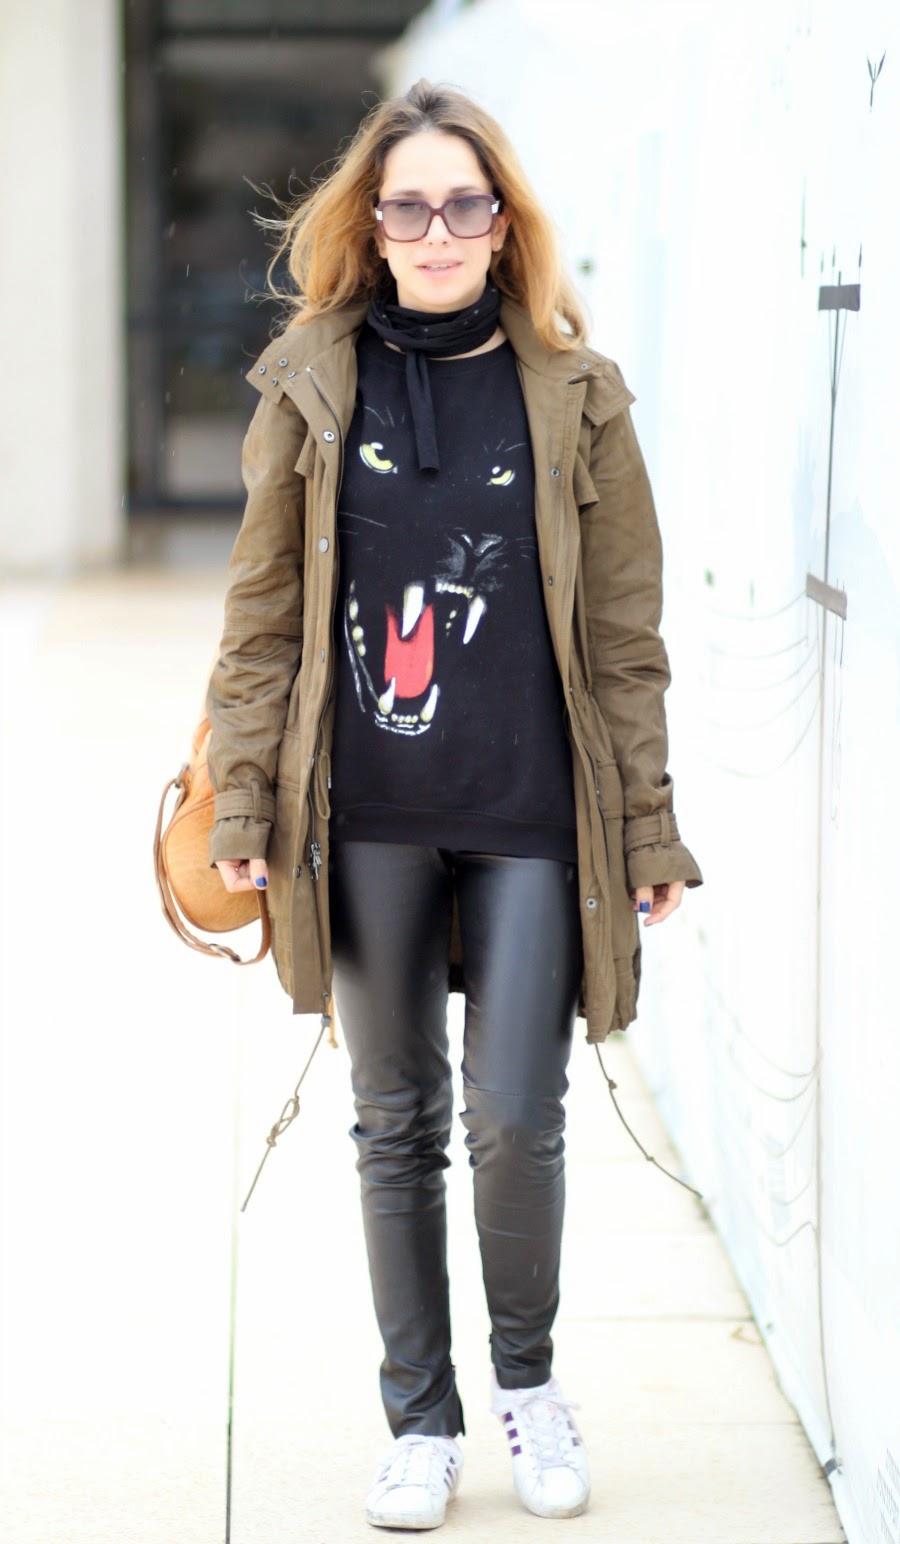 vince, ss15, lookoftheday, luxury, bandanascarf, ootd, streetstyle, mfw, fashionblog, אופנה, בלוגאופנה